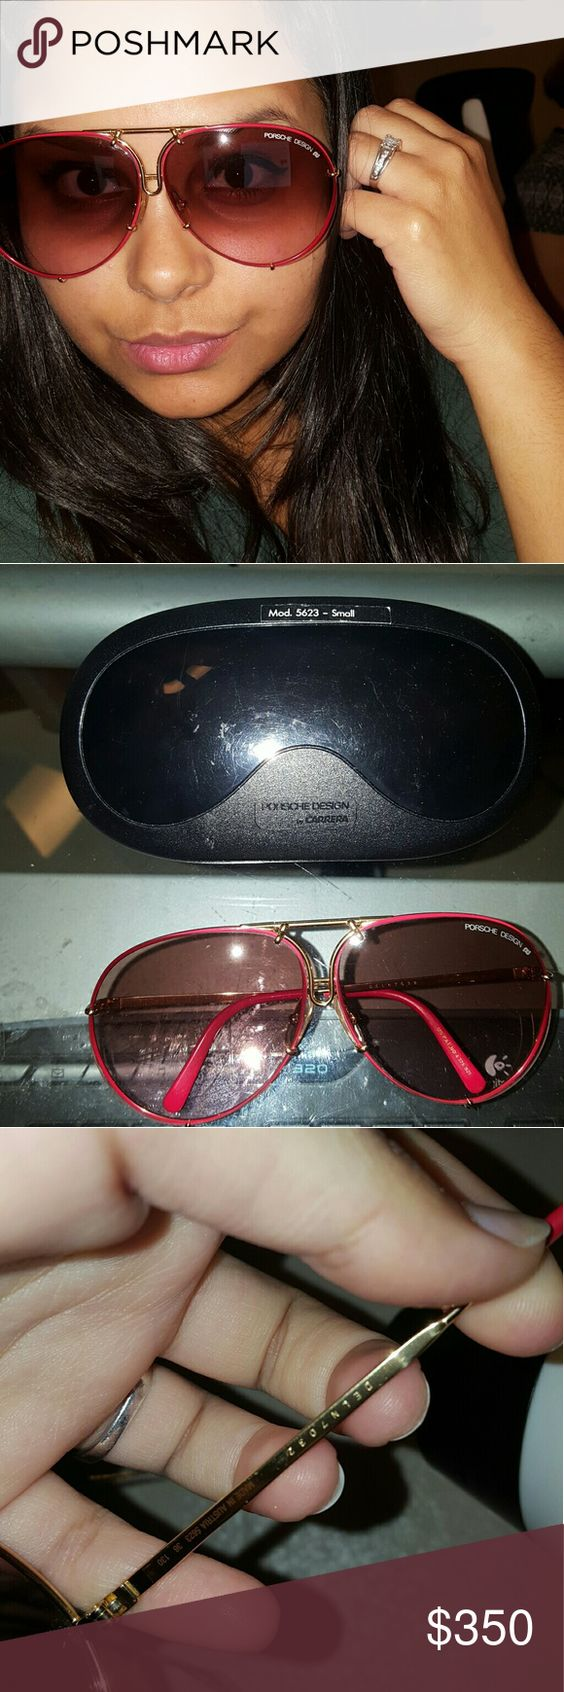 9bcdb0b6281 Porsche Carrera Sunglasses Aviator 5623 « One More Soul